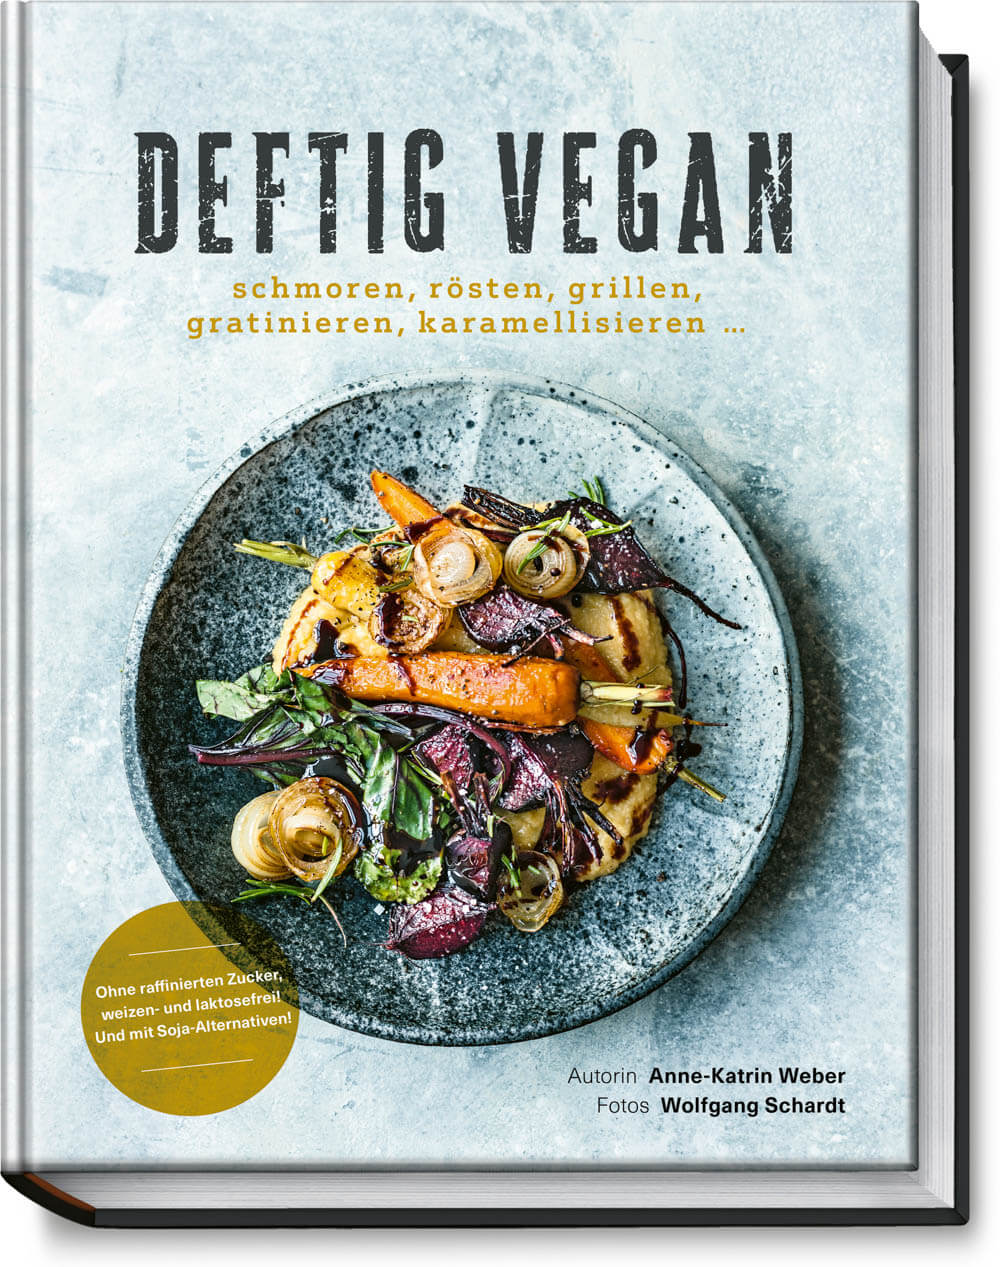 Deftig vegan Kochbuch - 25.09.2020